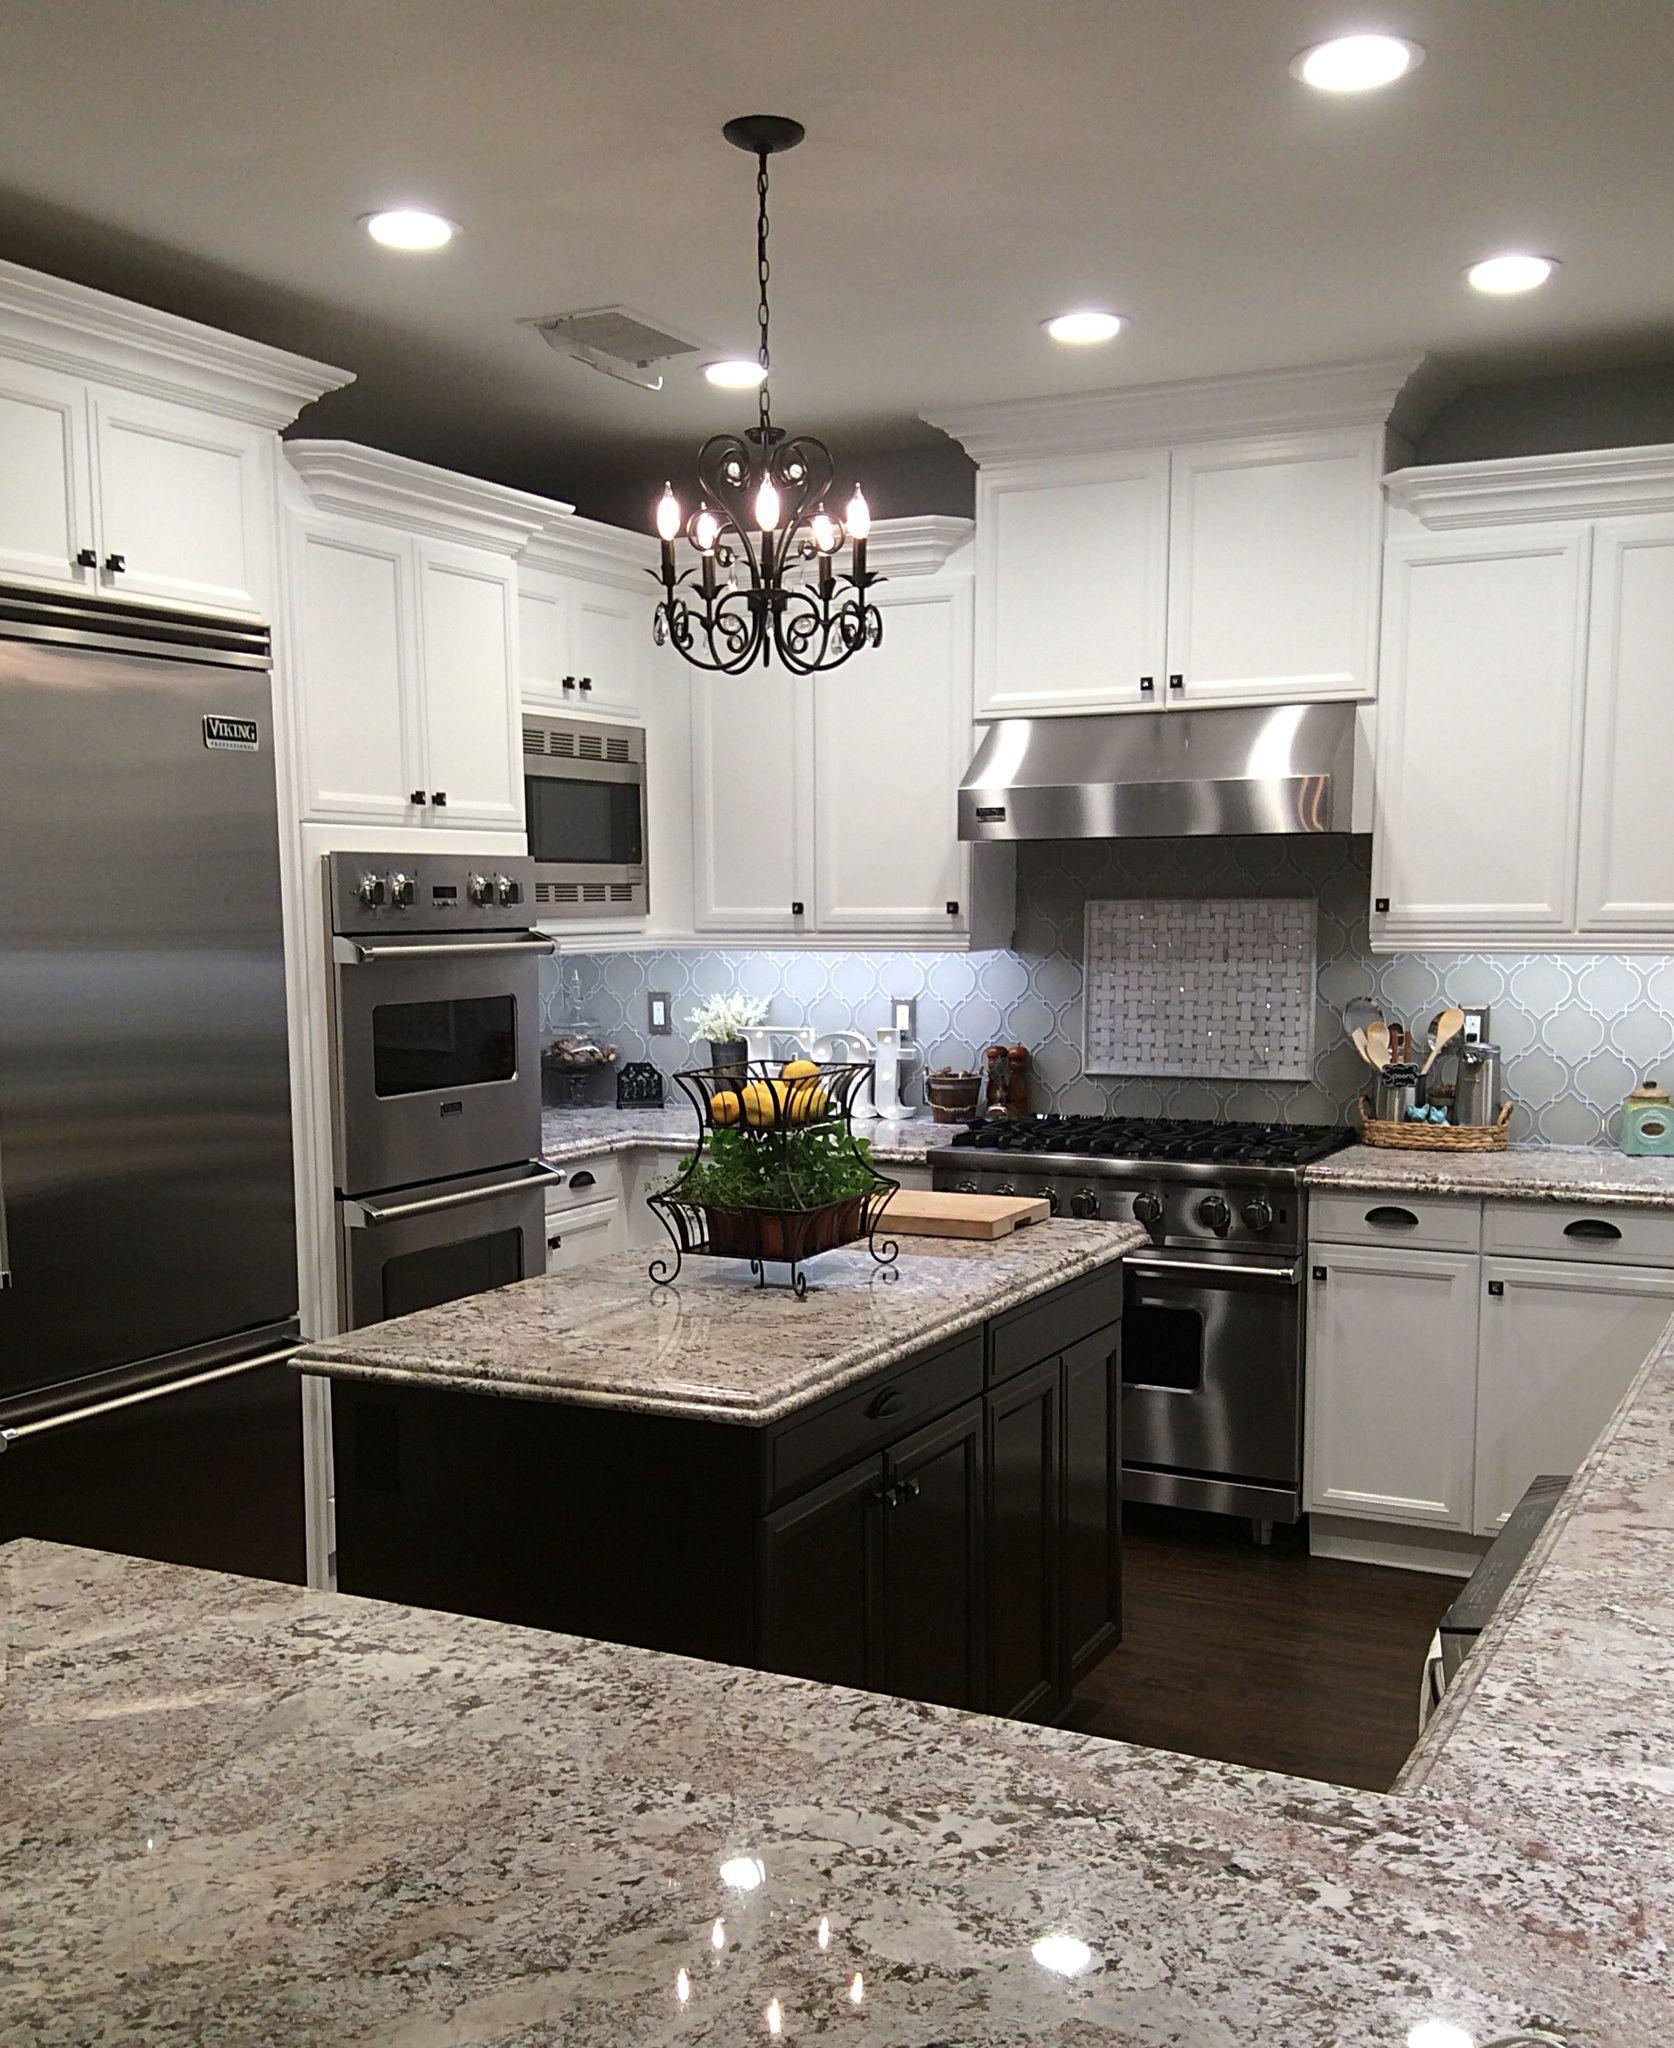 22 Jaw Dropping Small Kitchen Designs: 5 Jaw-Dropping Tricks: Diamond Backsplash Counter Tops